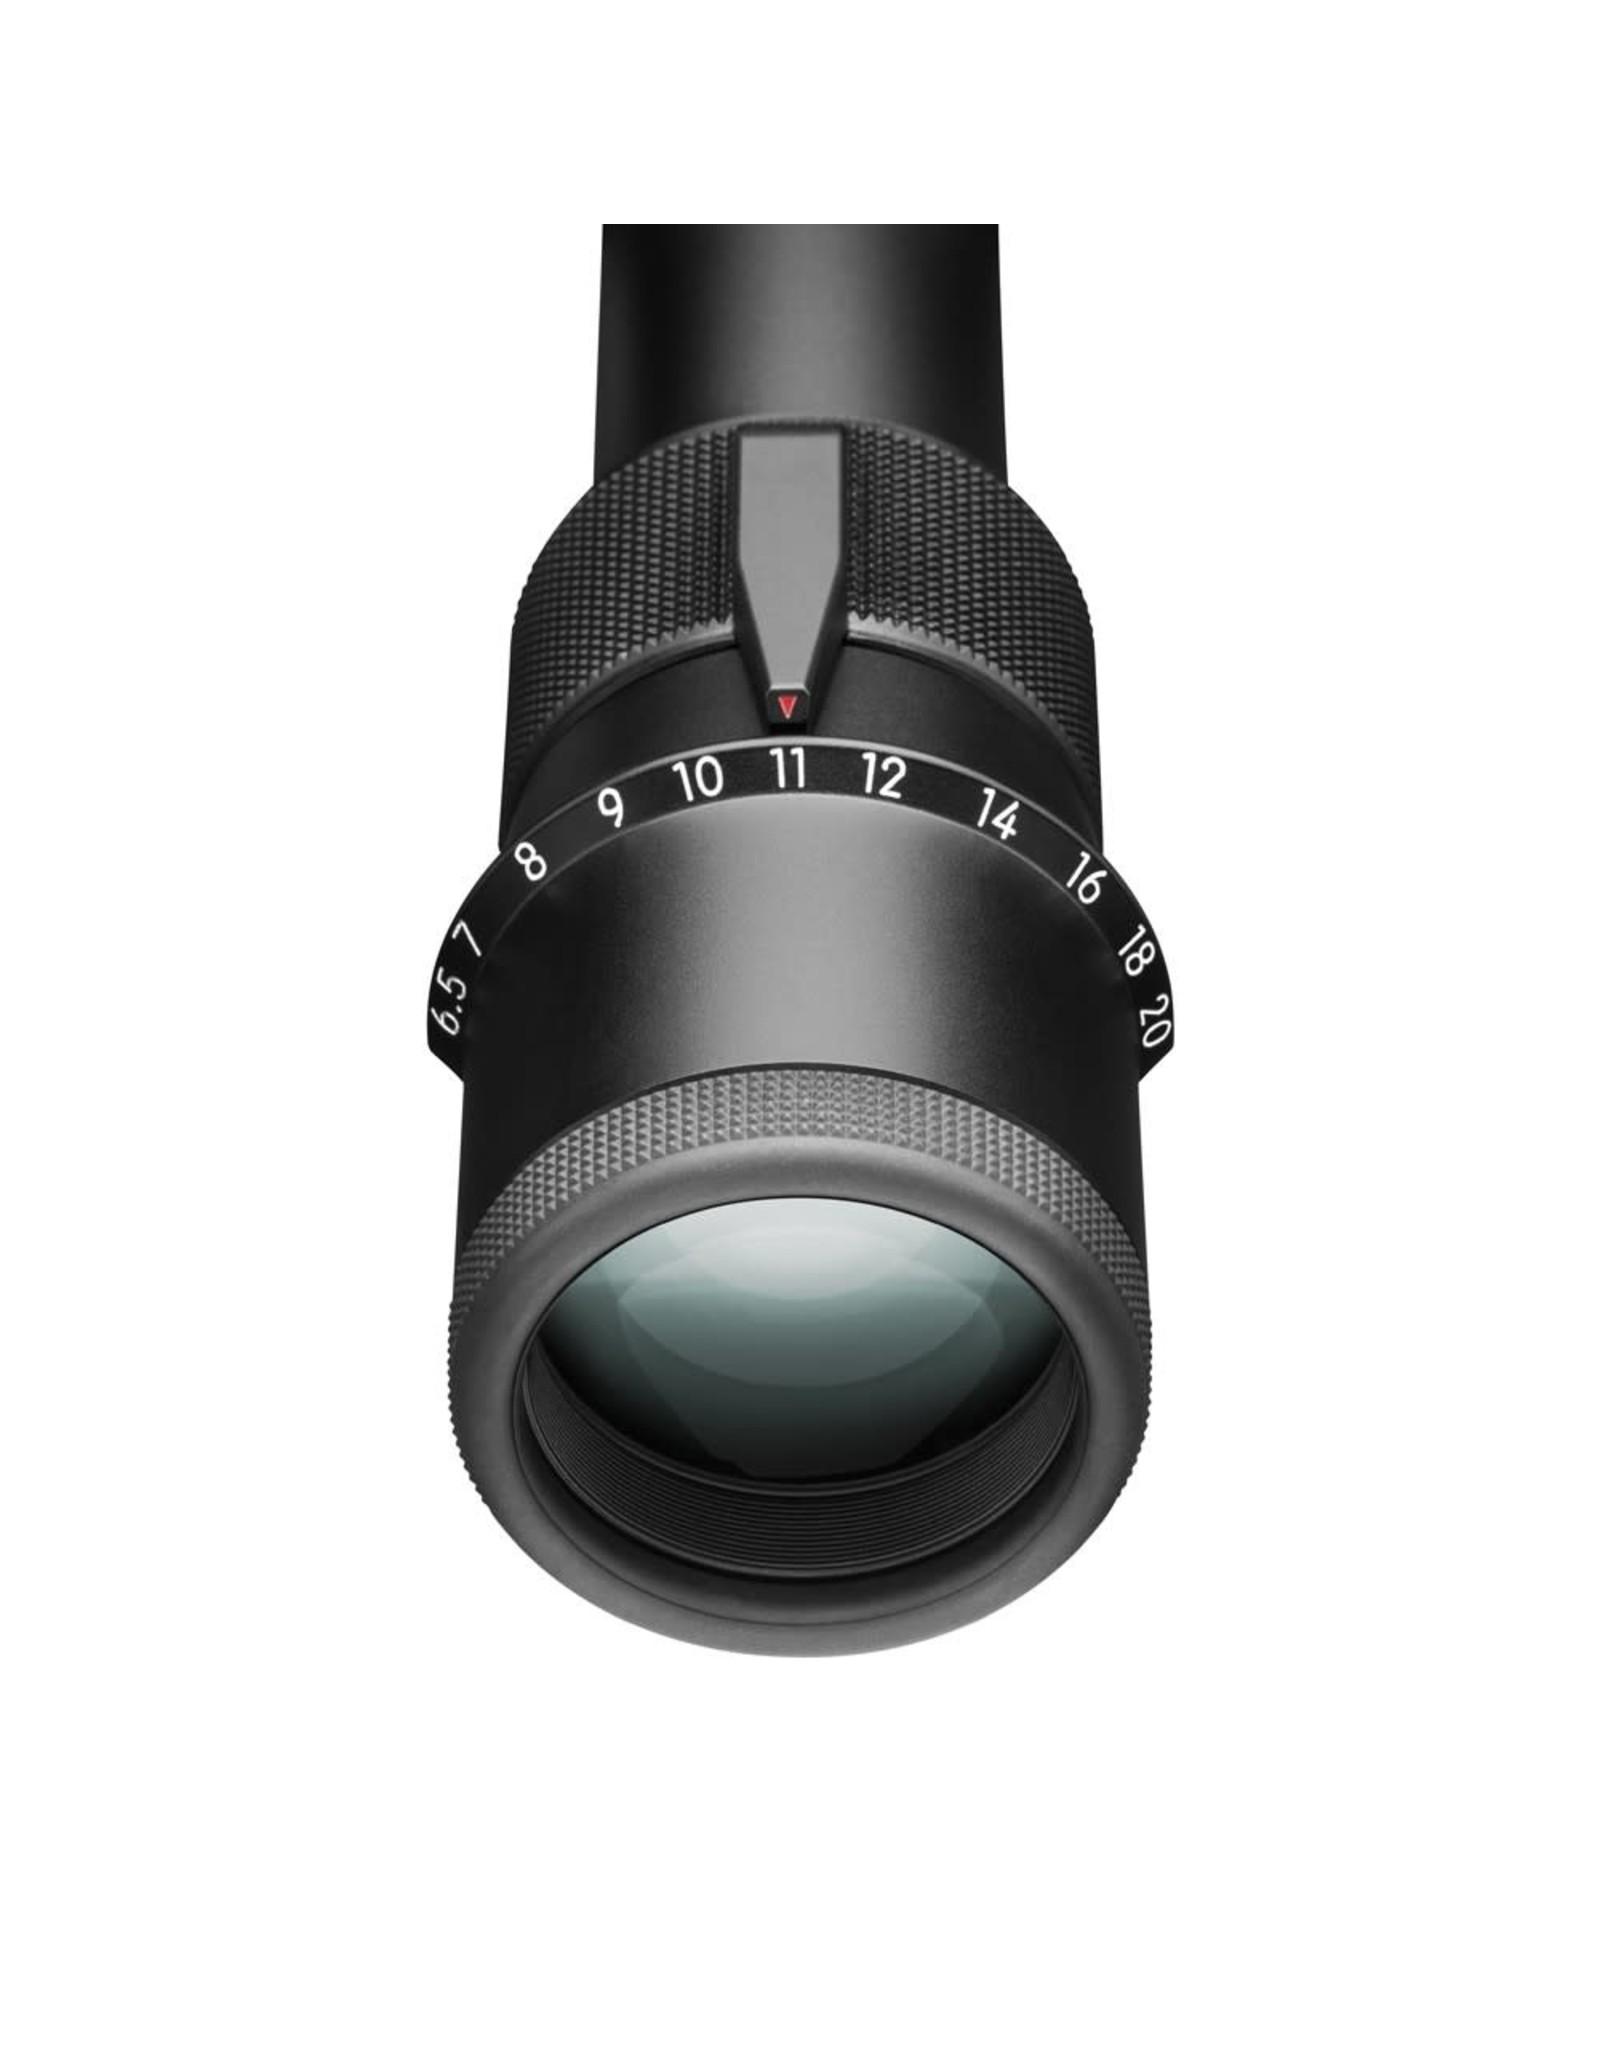 Vortex Optics VORTEX VIPER 6.5-20X50 PA RIFLESCOPE DEADHOLD BDC